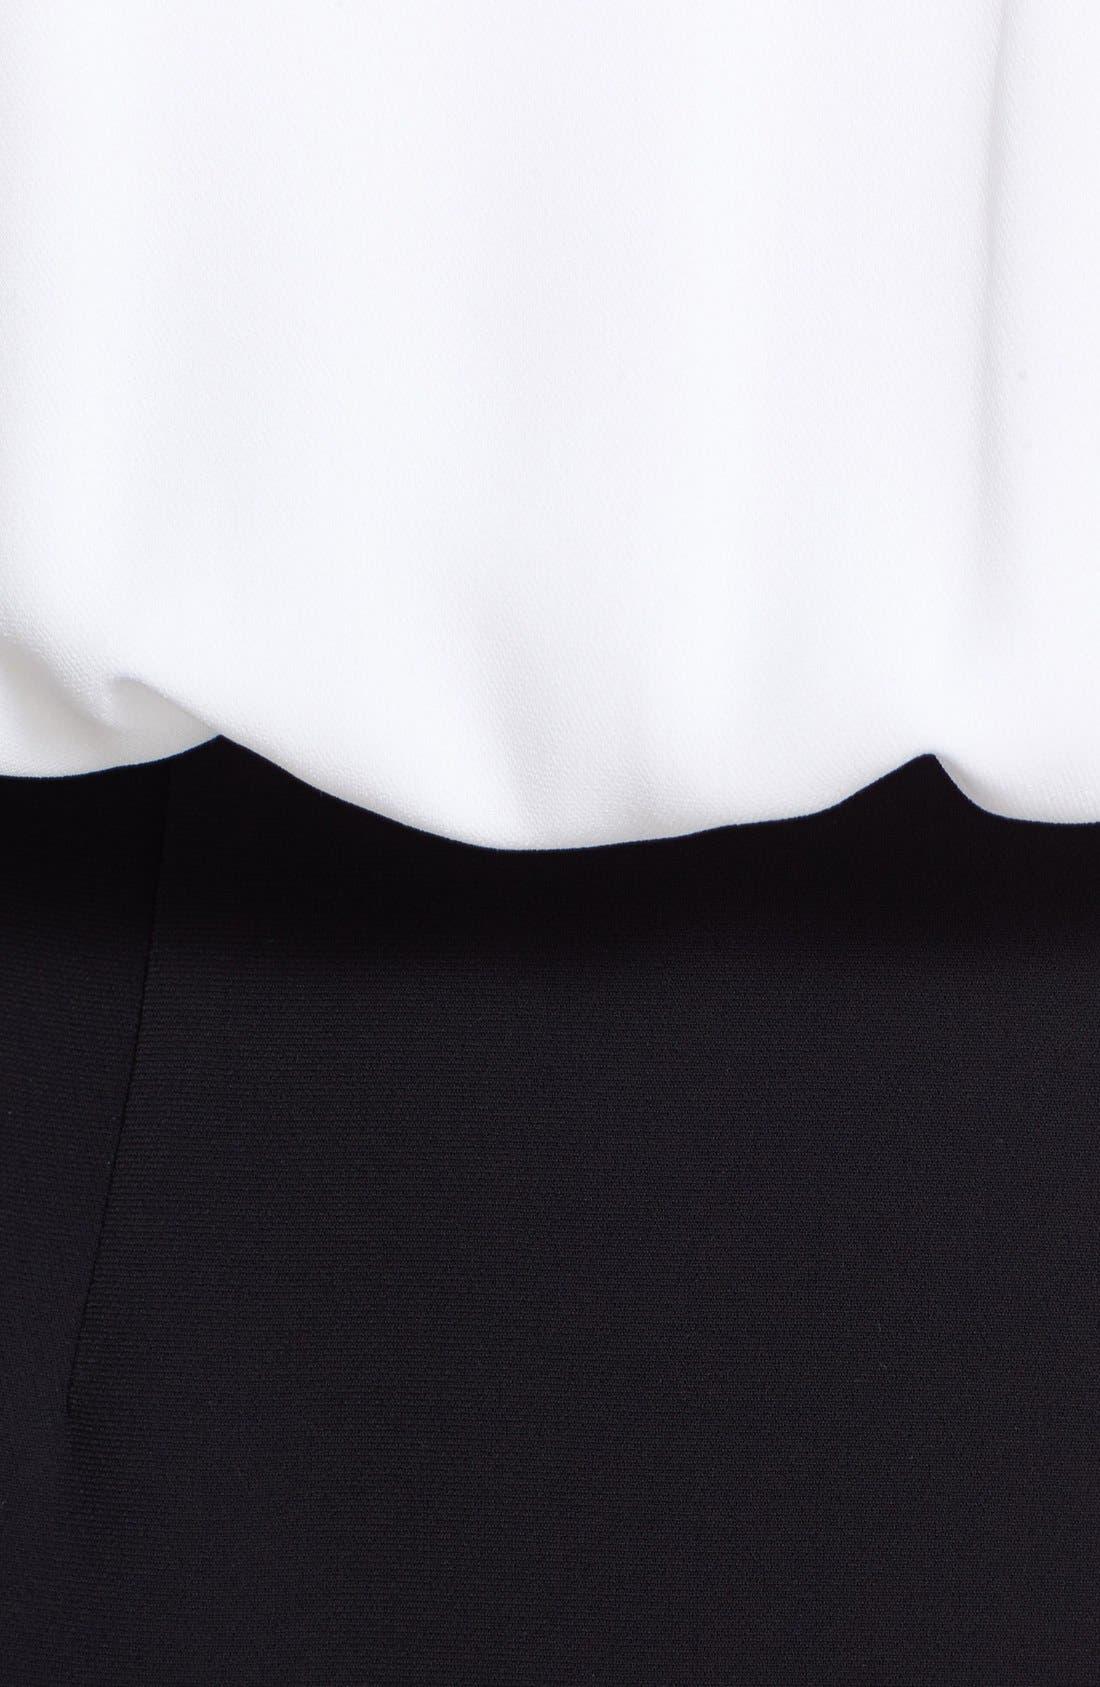 Open Back Crepe Blouson Dress,                             Alternate thumbnail 3, color,                             White/ Black